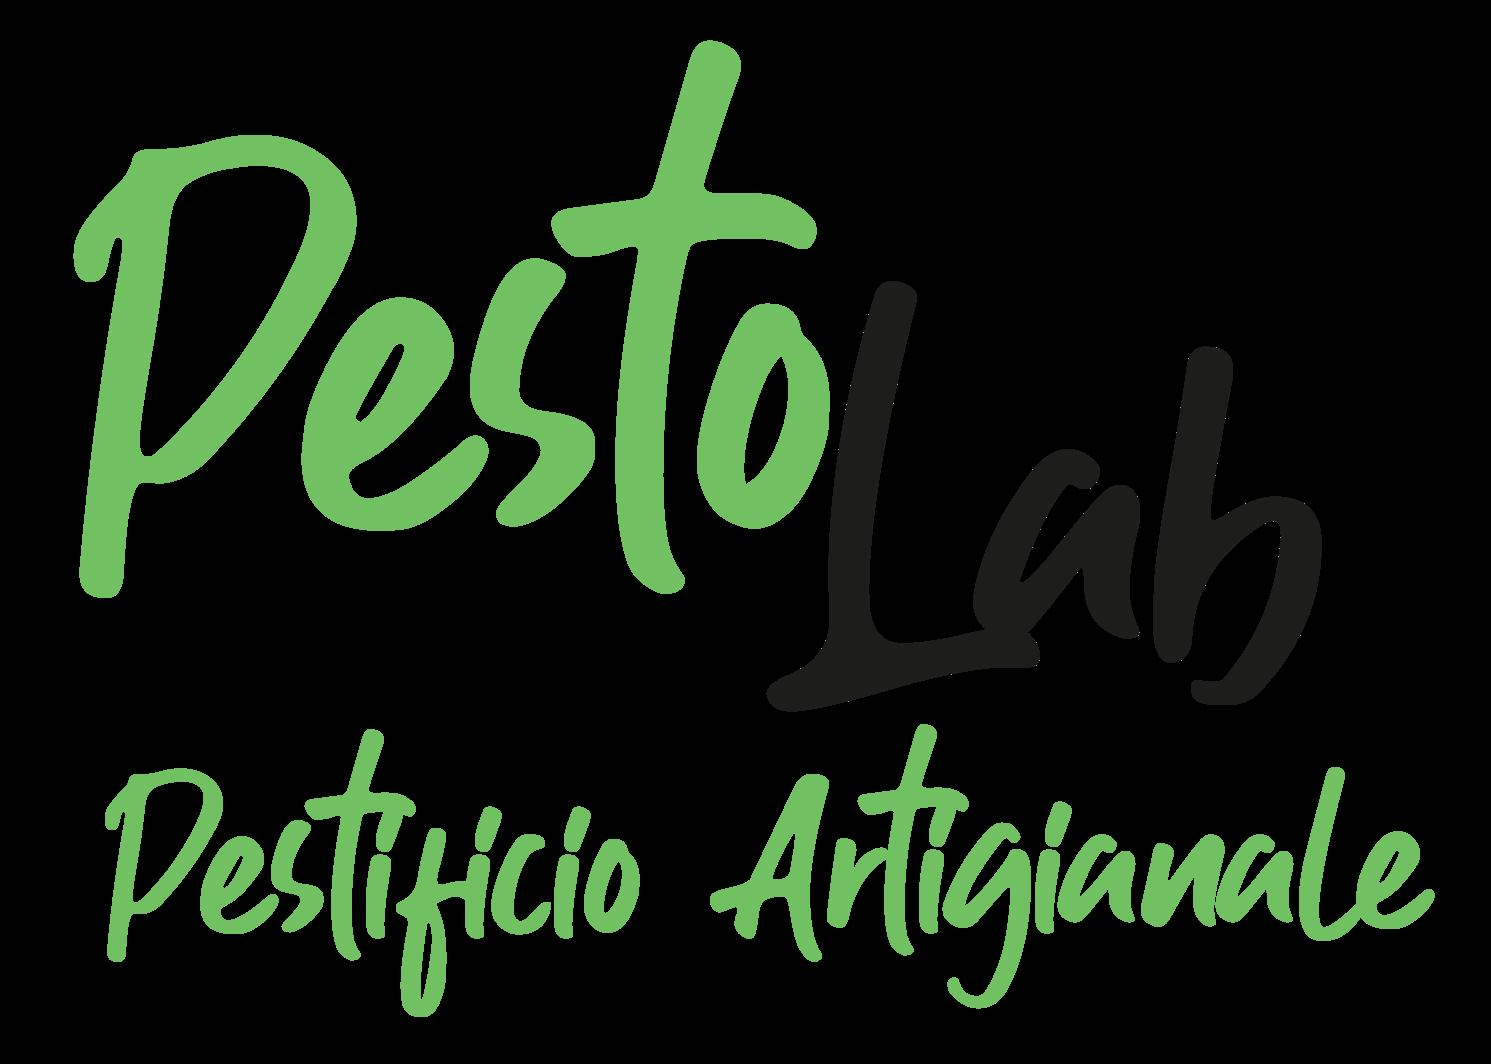 Baico PestoLab logo